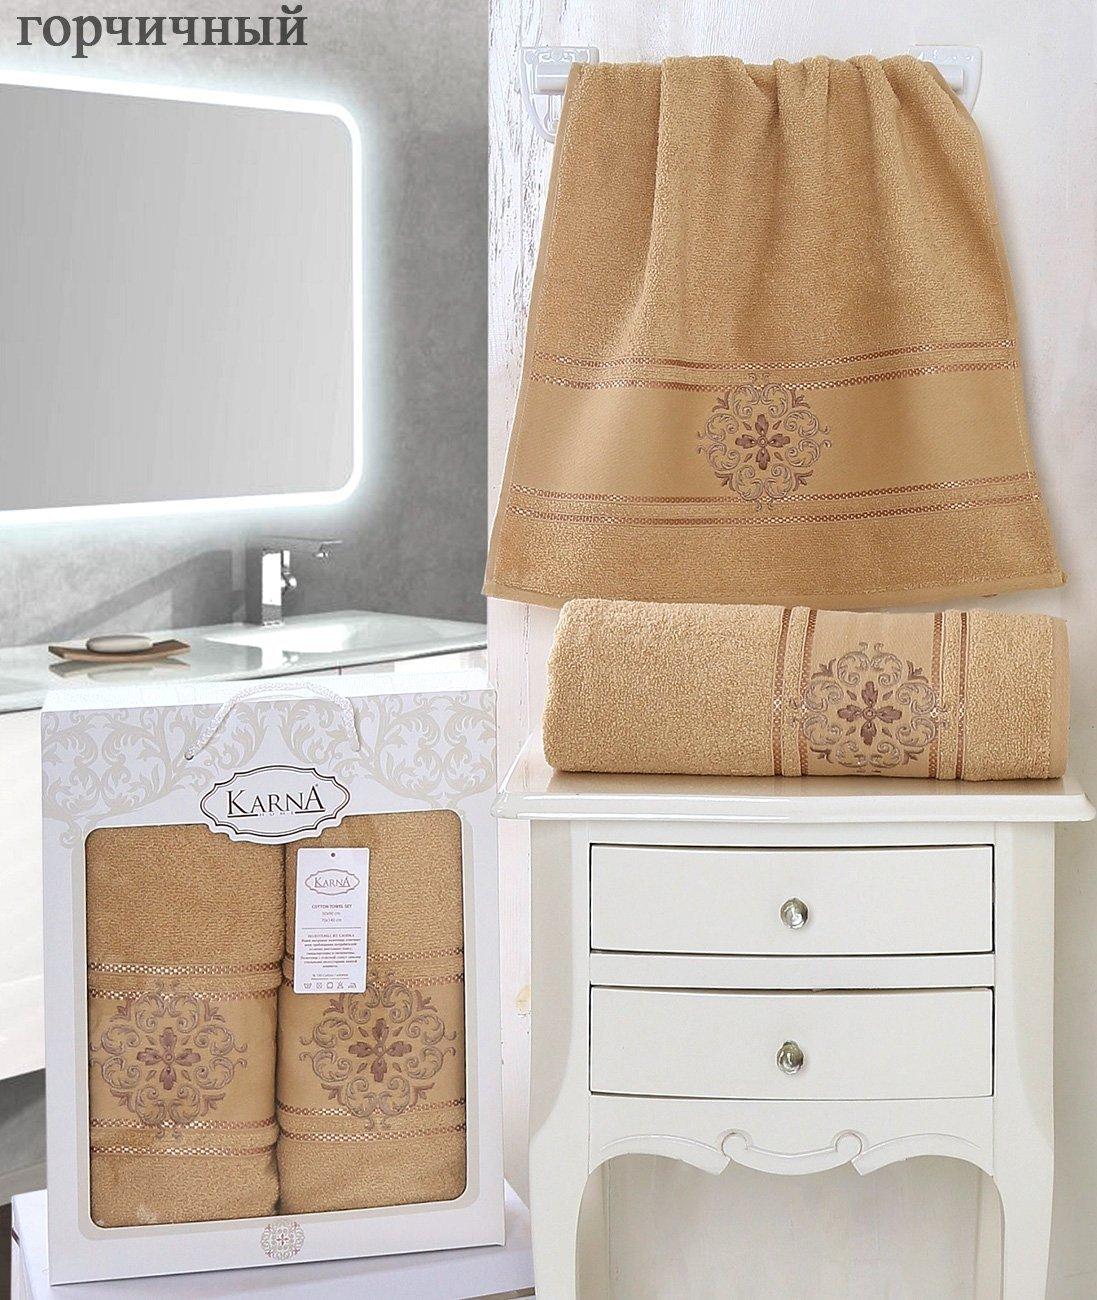 Комплект махровых полотенец (50x90+70x140) Seher Karna